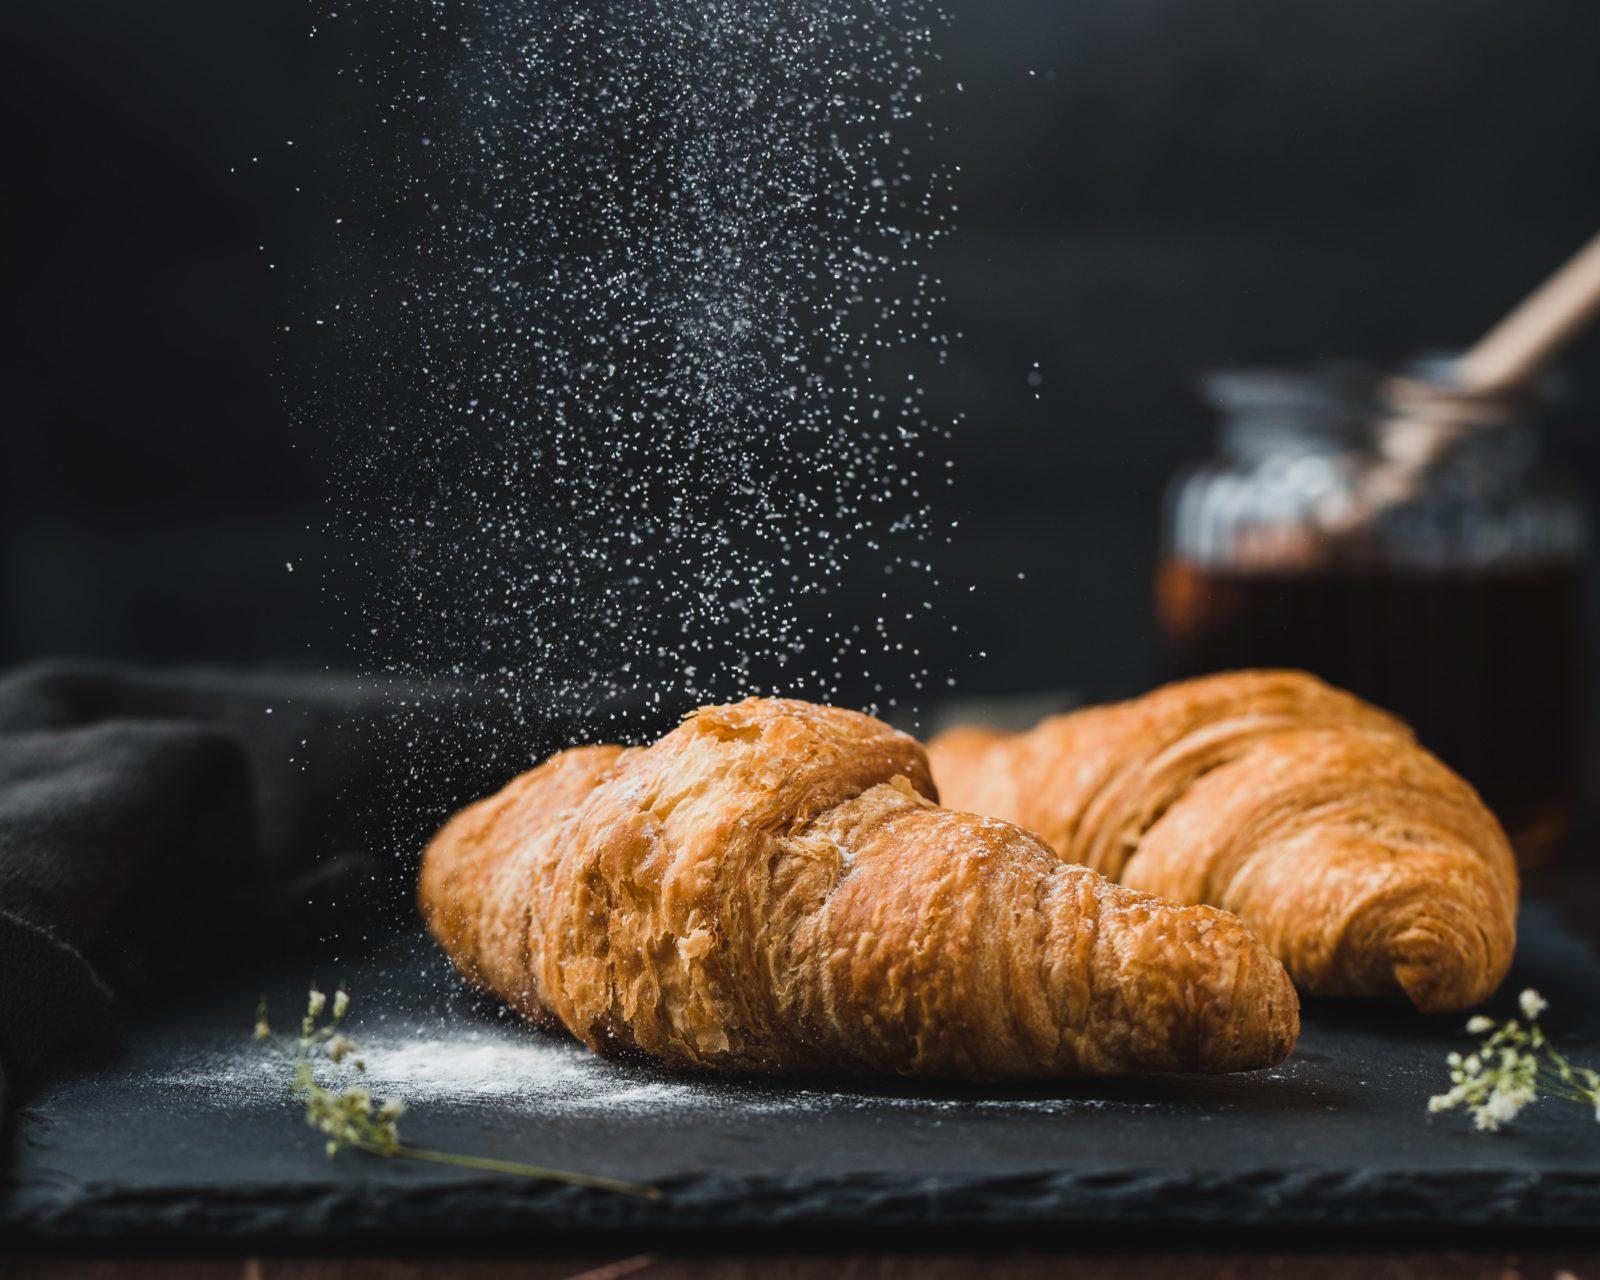 Mondelēz International acquires European snacking business, Chipita S.A.